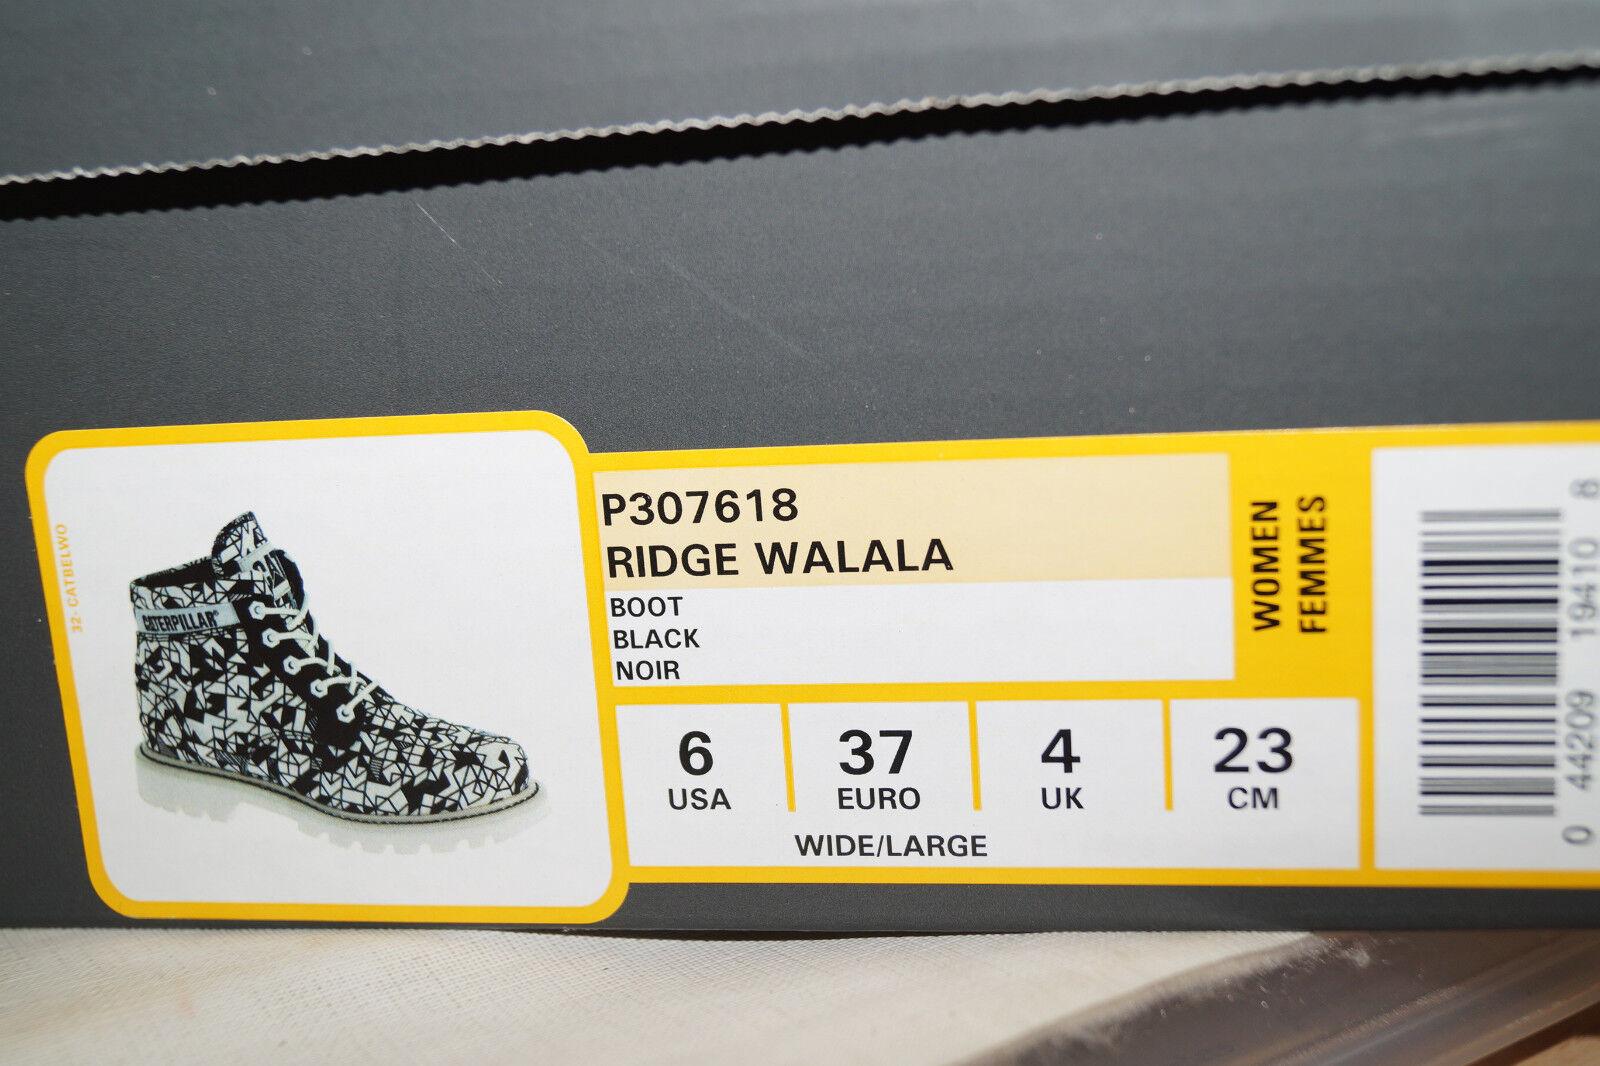 Caterpillar Ridge Walala UK.4 Womans Damen Schnürboots EU.37 UK.4 Walala schwarz weiss ccab37